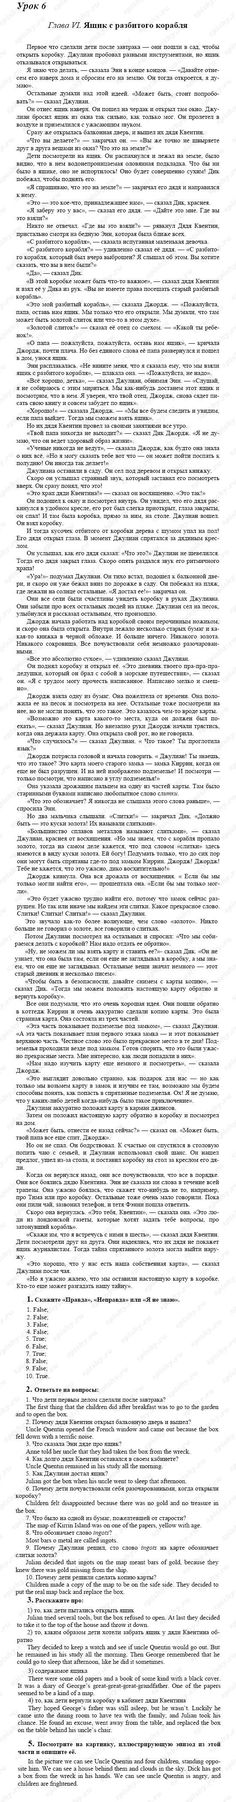 Гдз по русскому языку 7 класс с.д.ашурова г.н.никольская